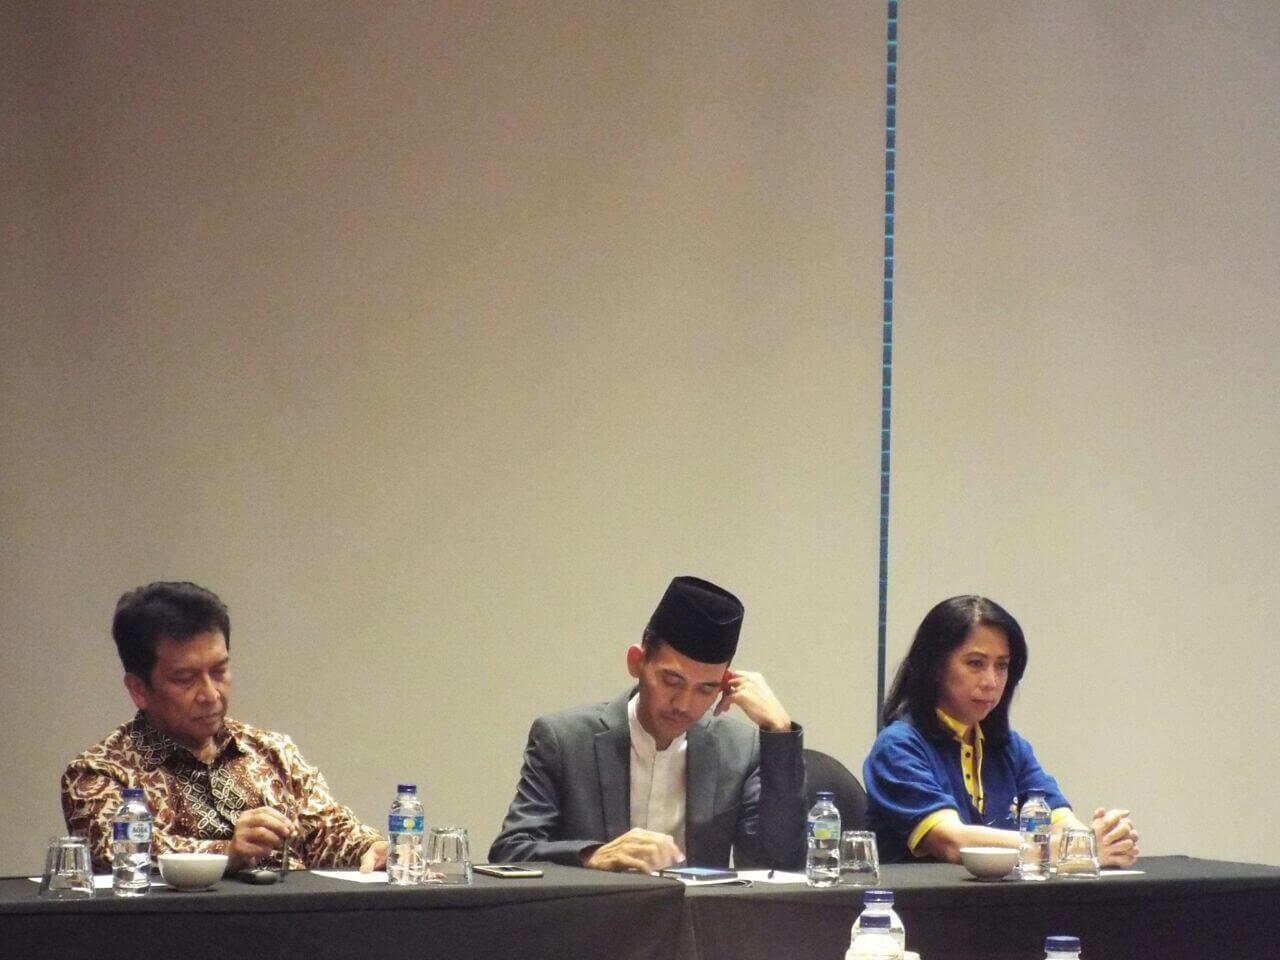 Pemateri dalam acara ini, DR. Jean, DR. HM Asrorun (MUI), dr Hindrawan(IDAI)